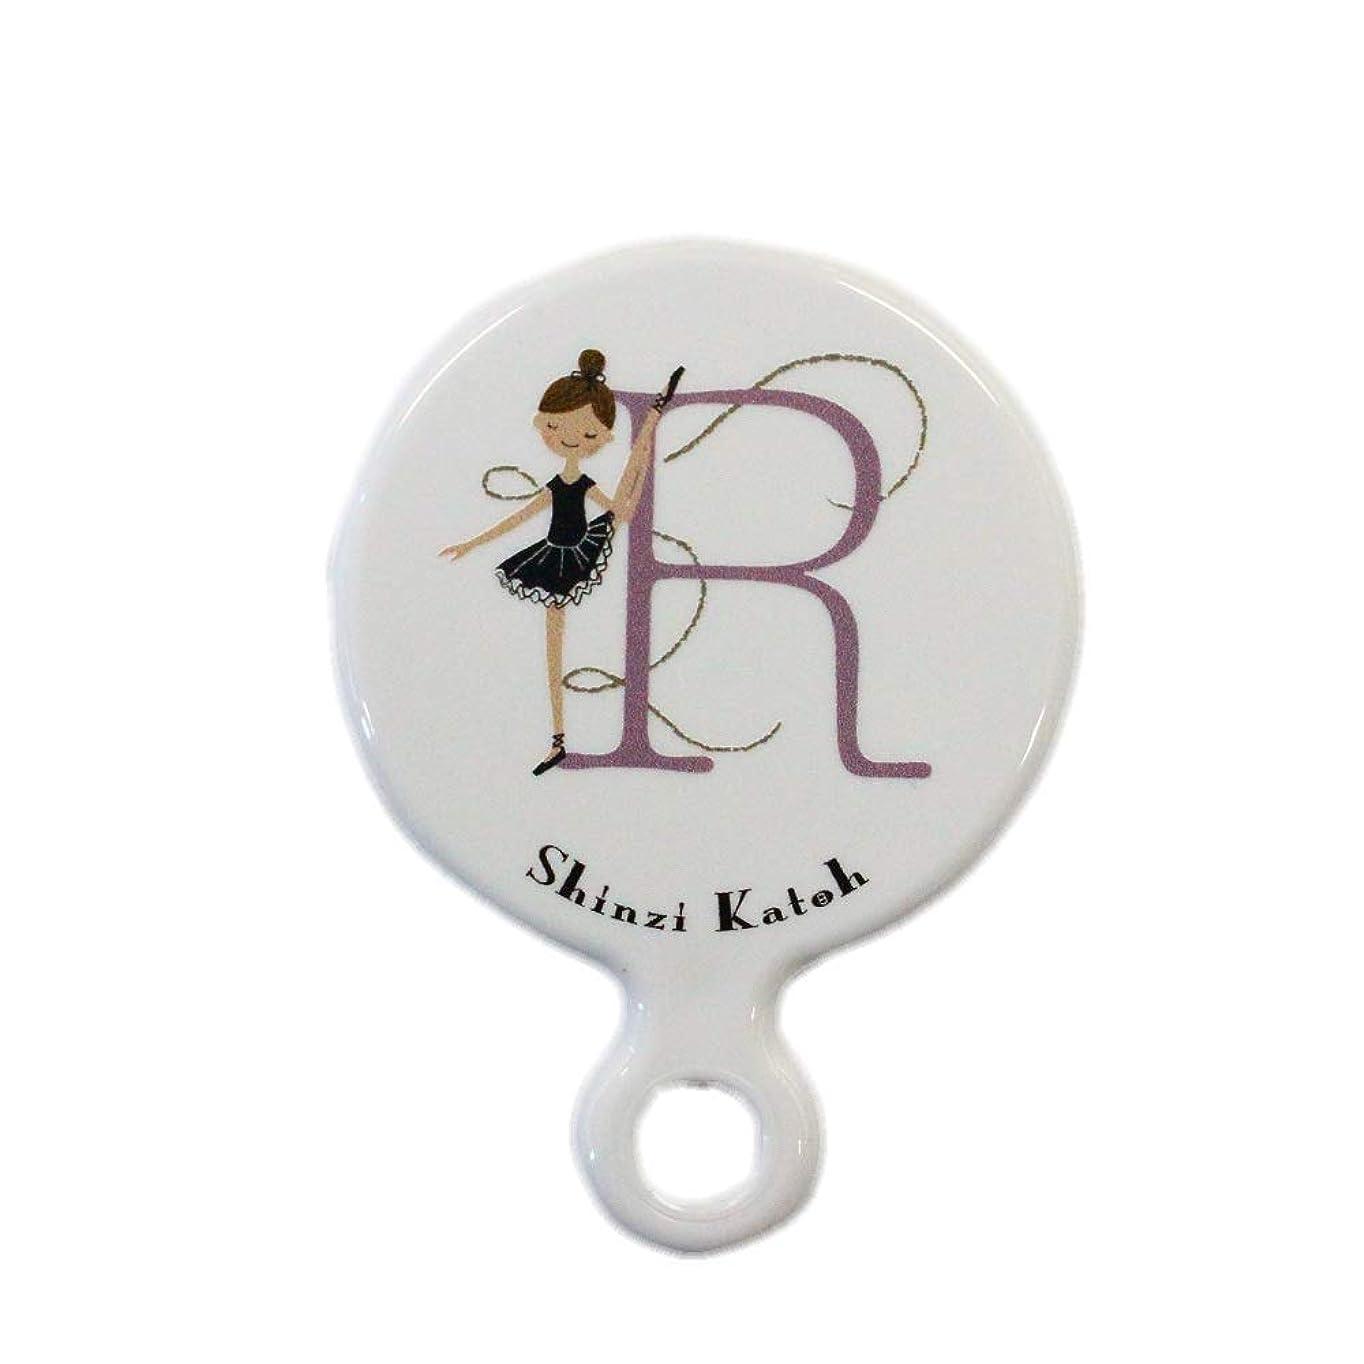 Shinzi Katoh プチミラー(ballet R)PMR1009